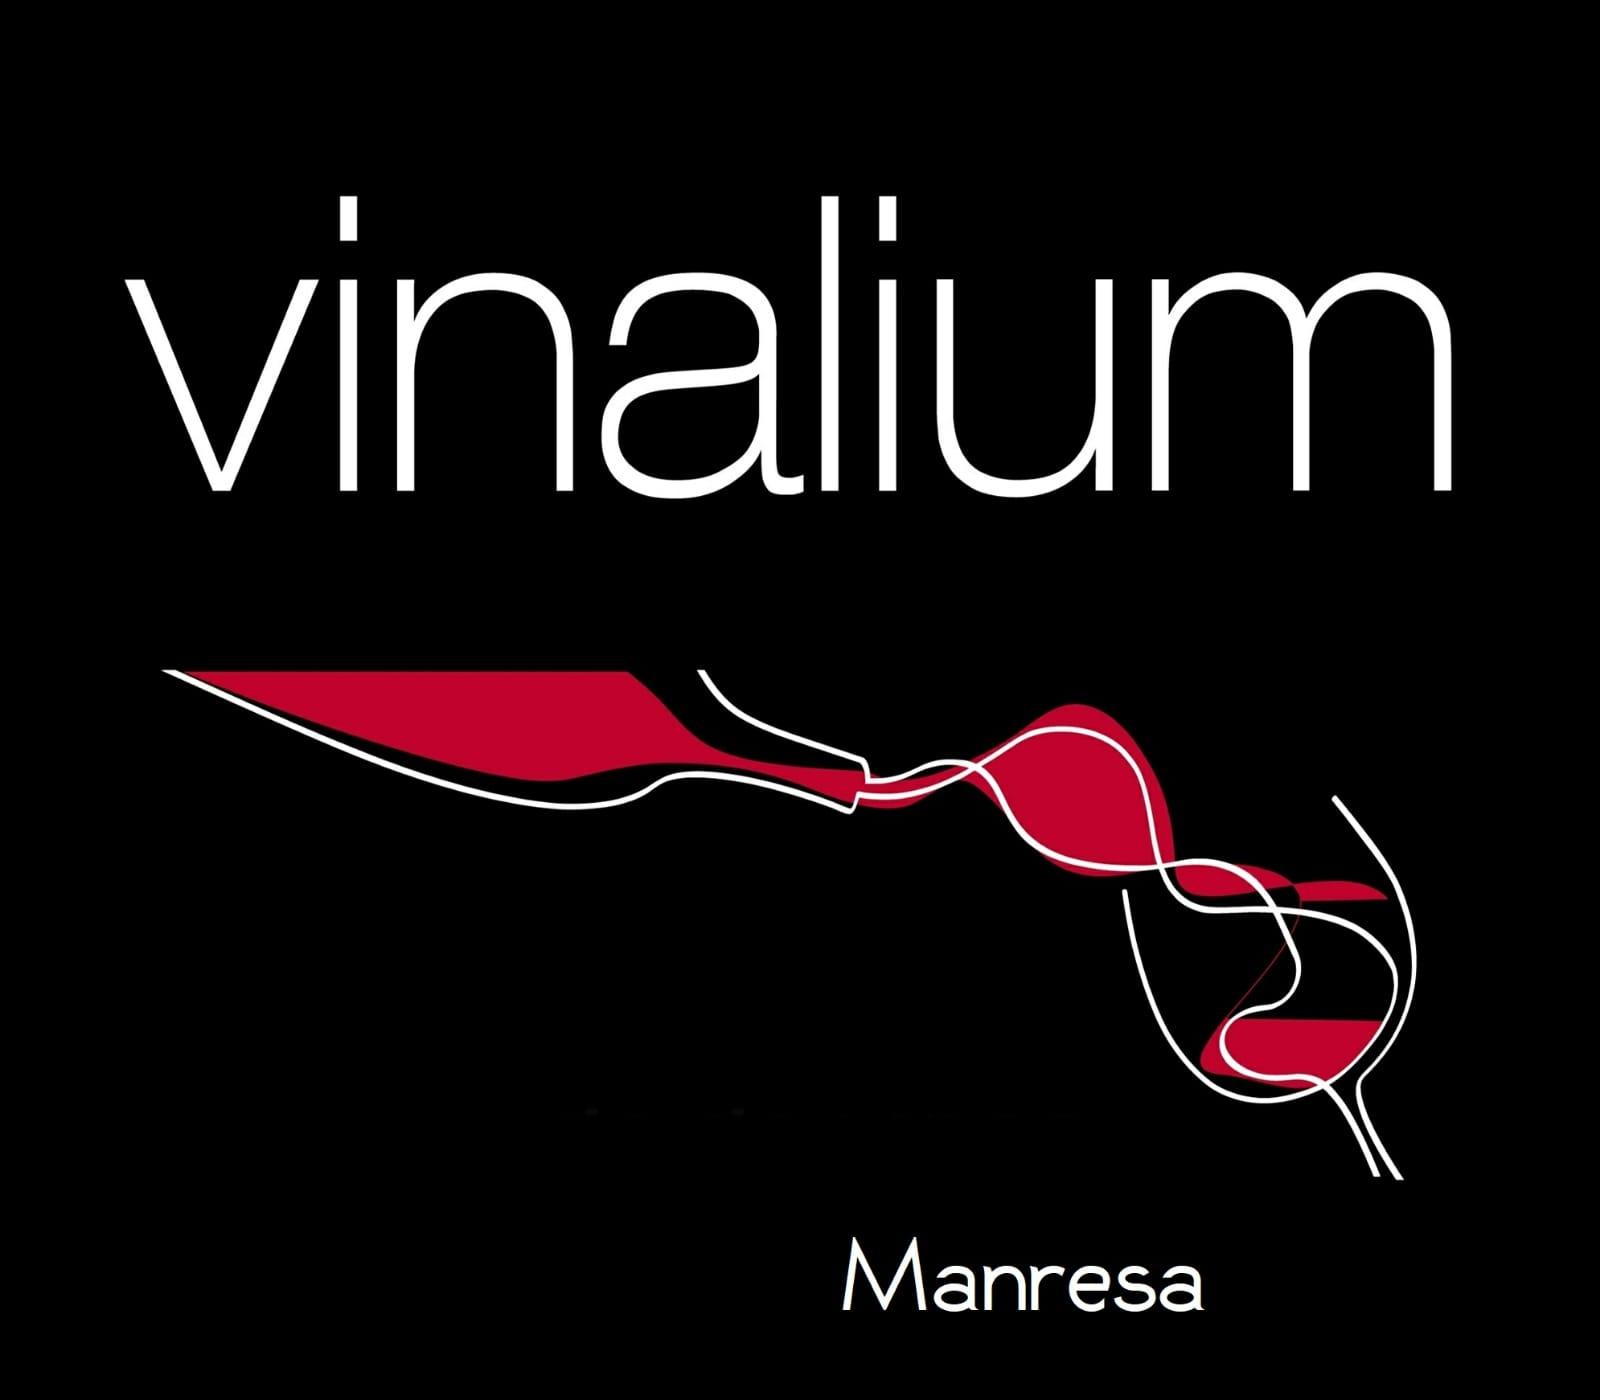 WONDERFUL WINES SL (Vinalium Manresa)